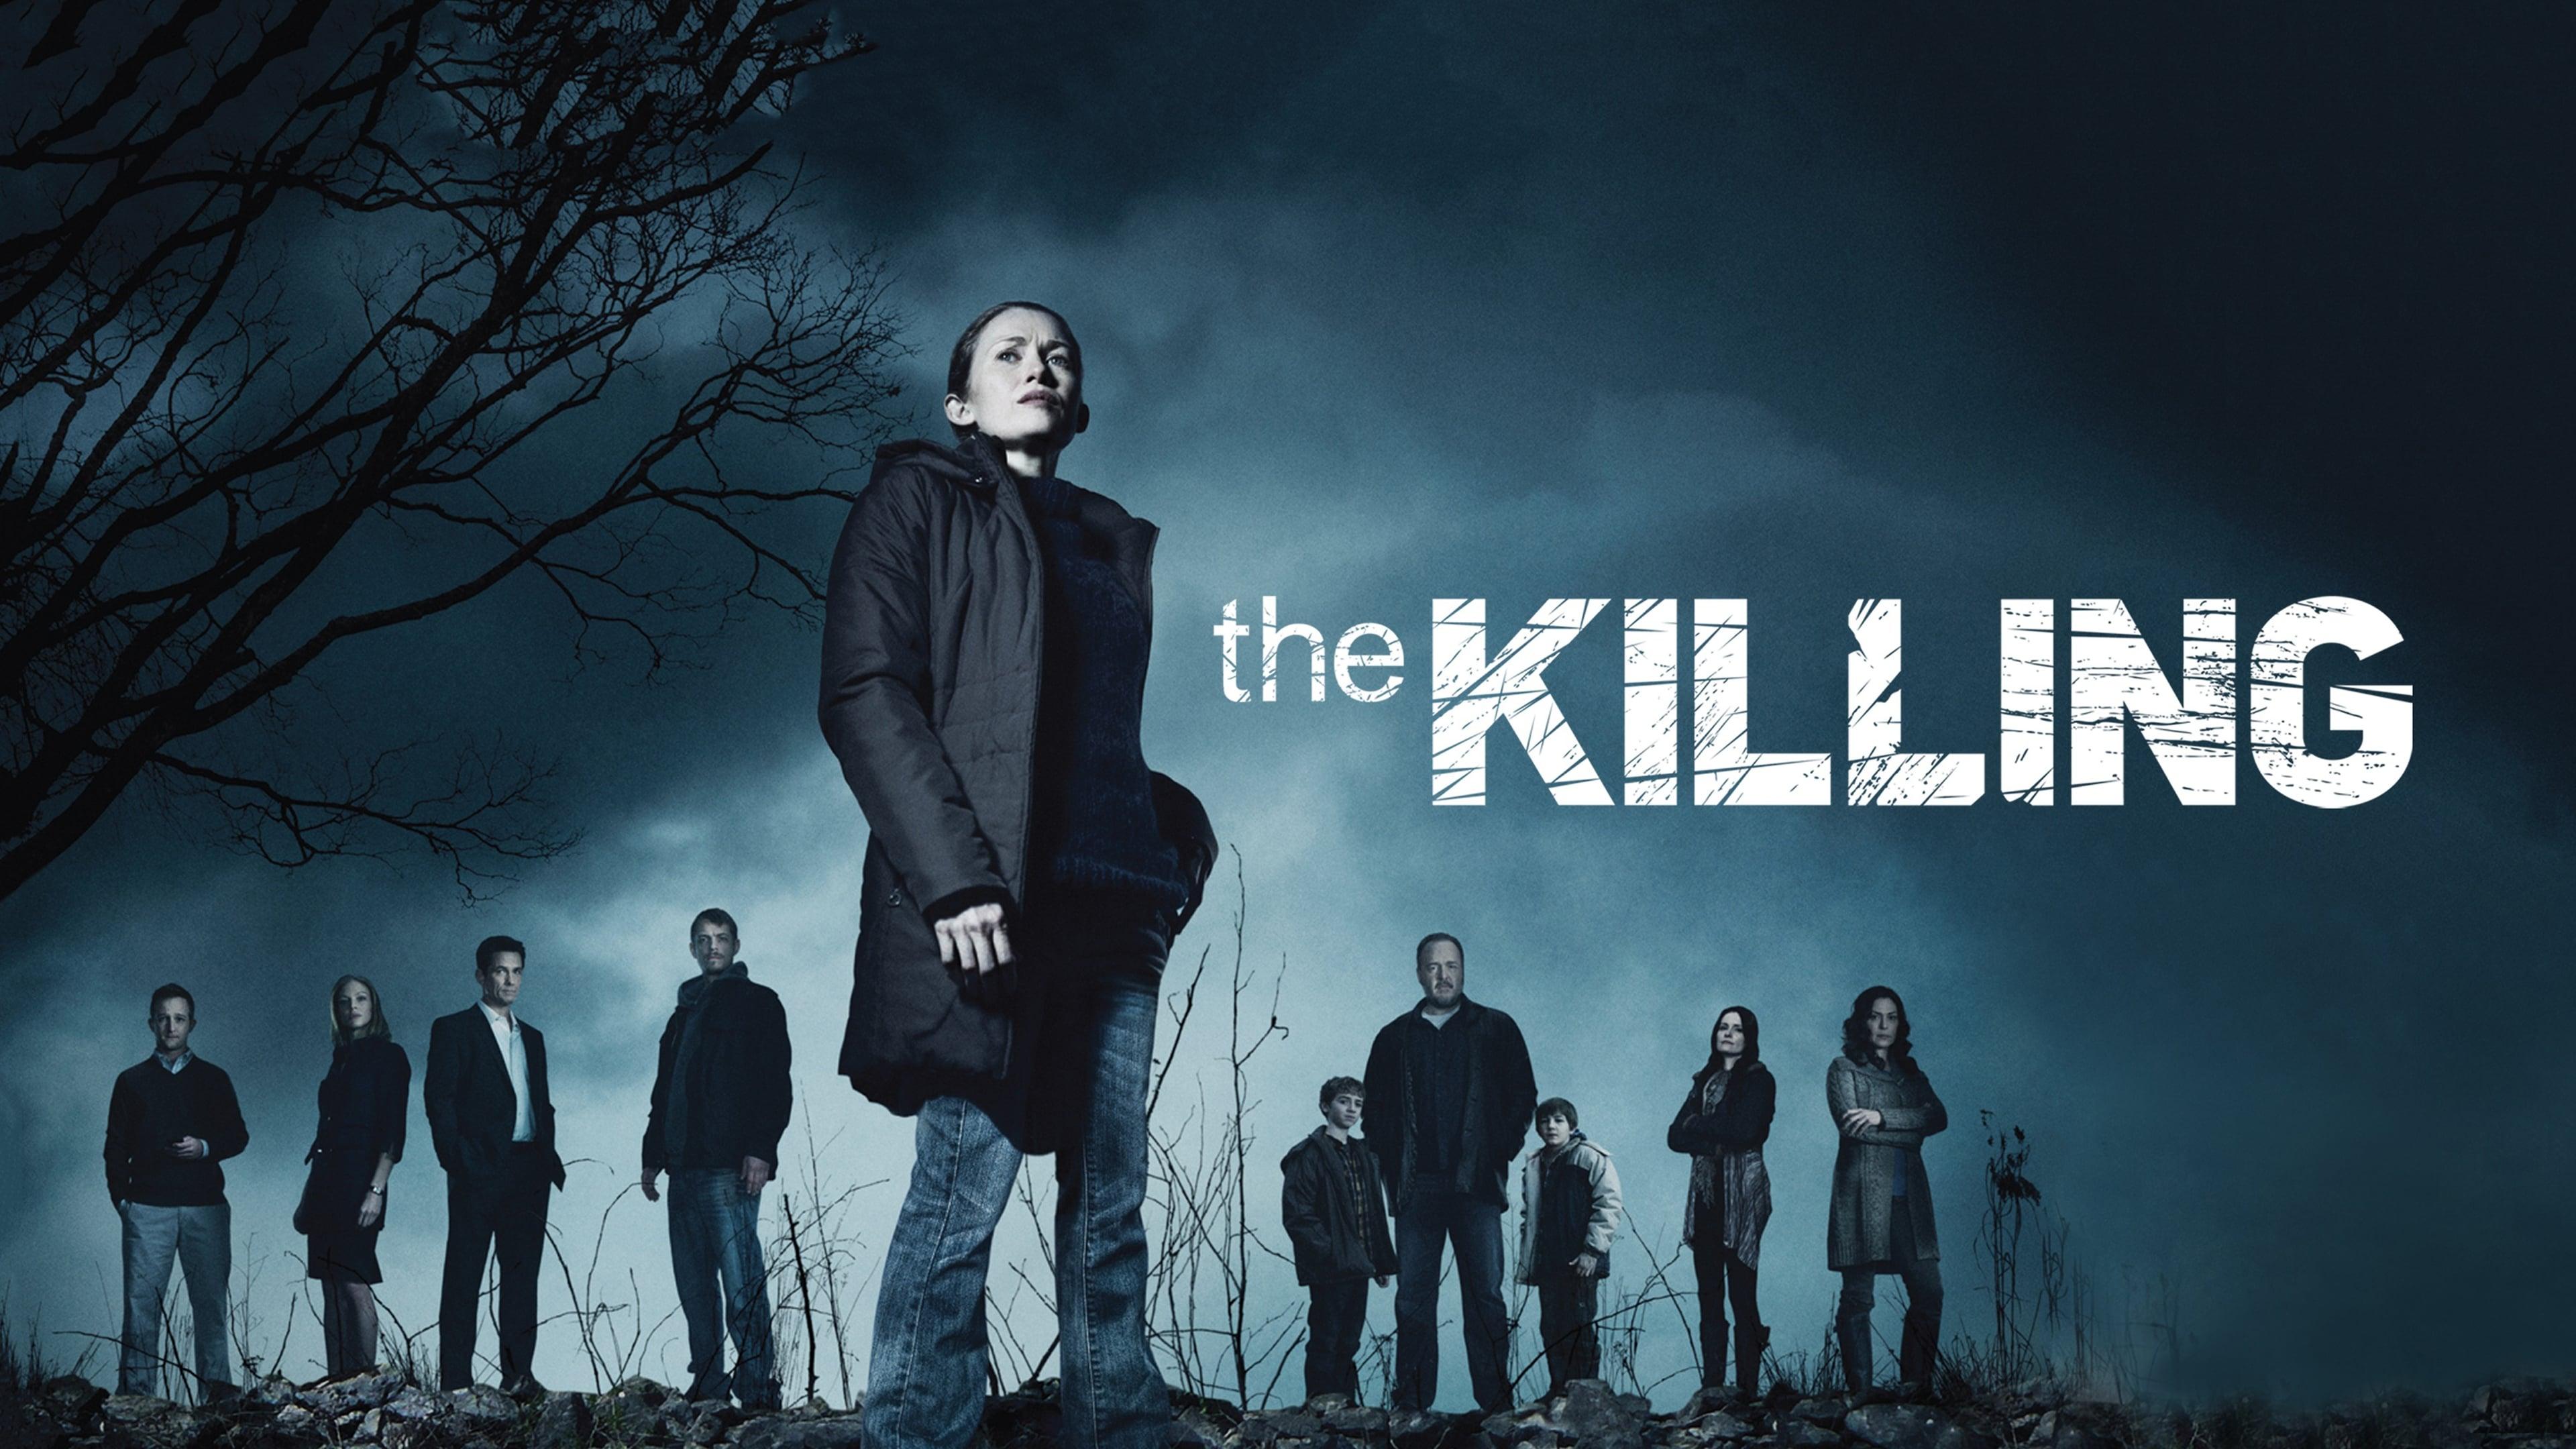 谋杀 第四季 The Killing Season 4 (2014) 中文字幕